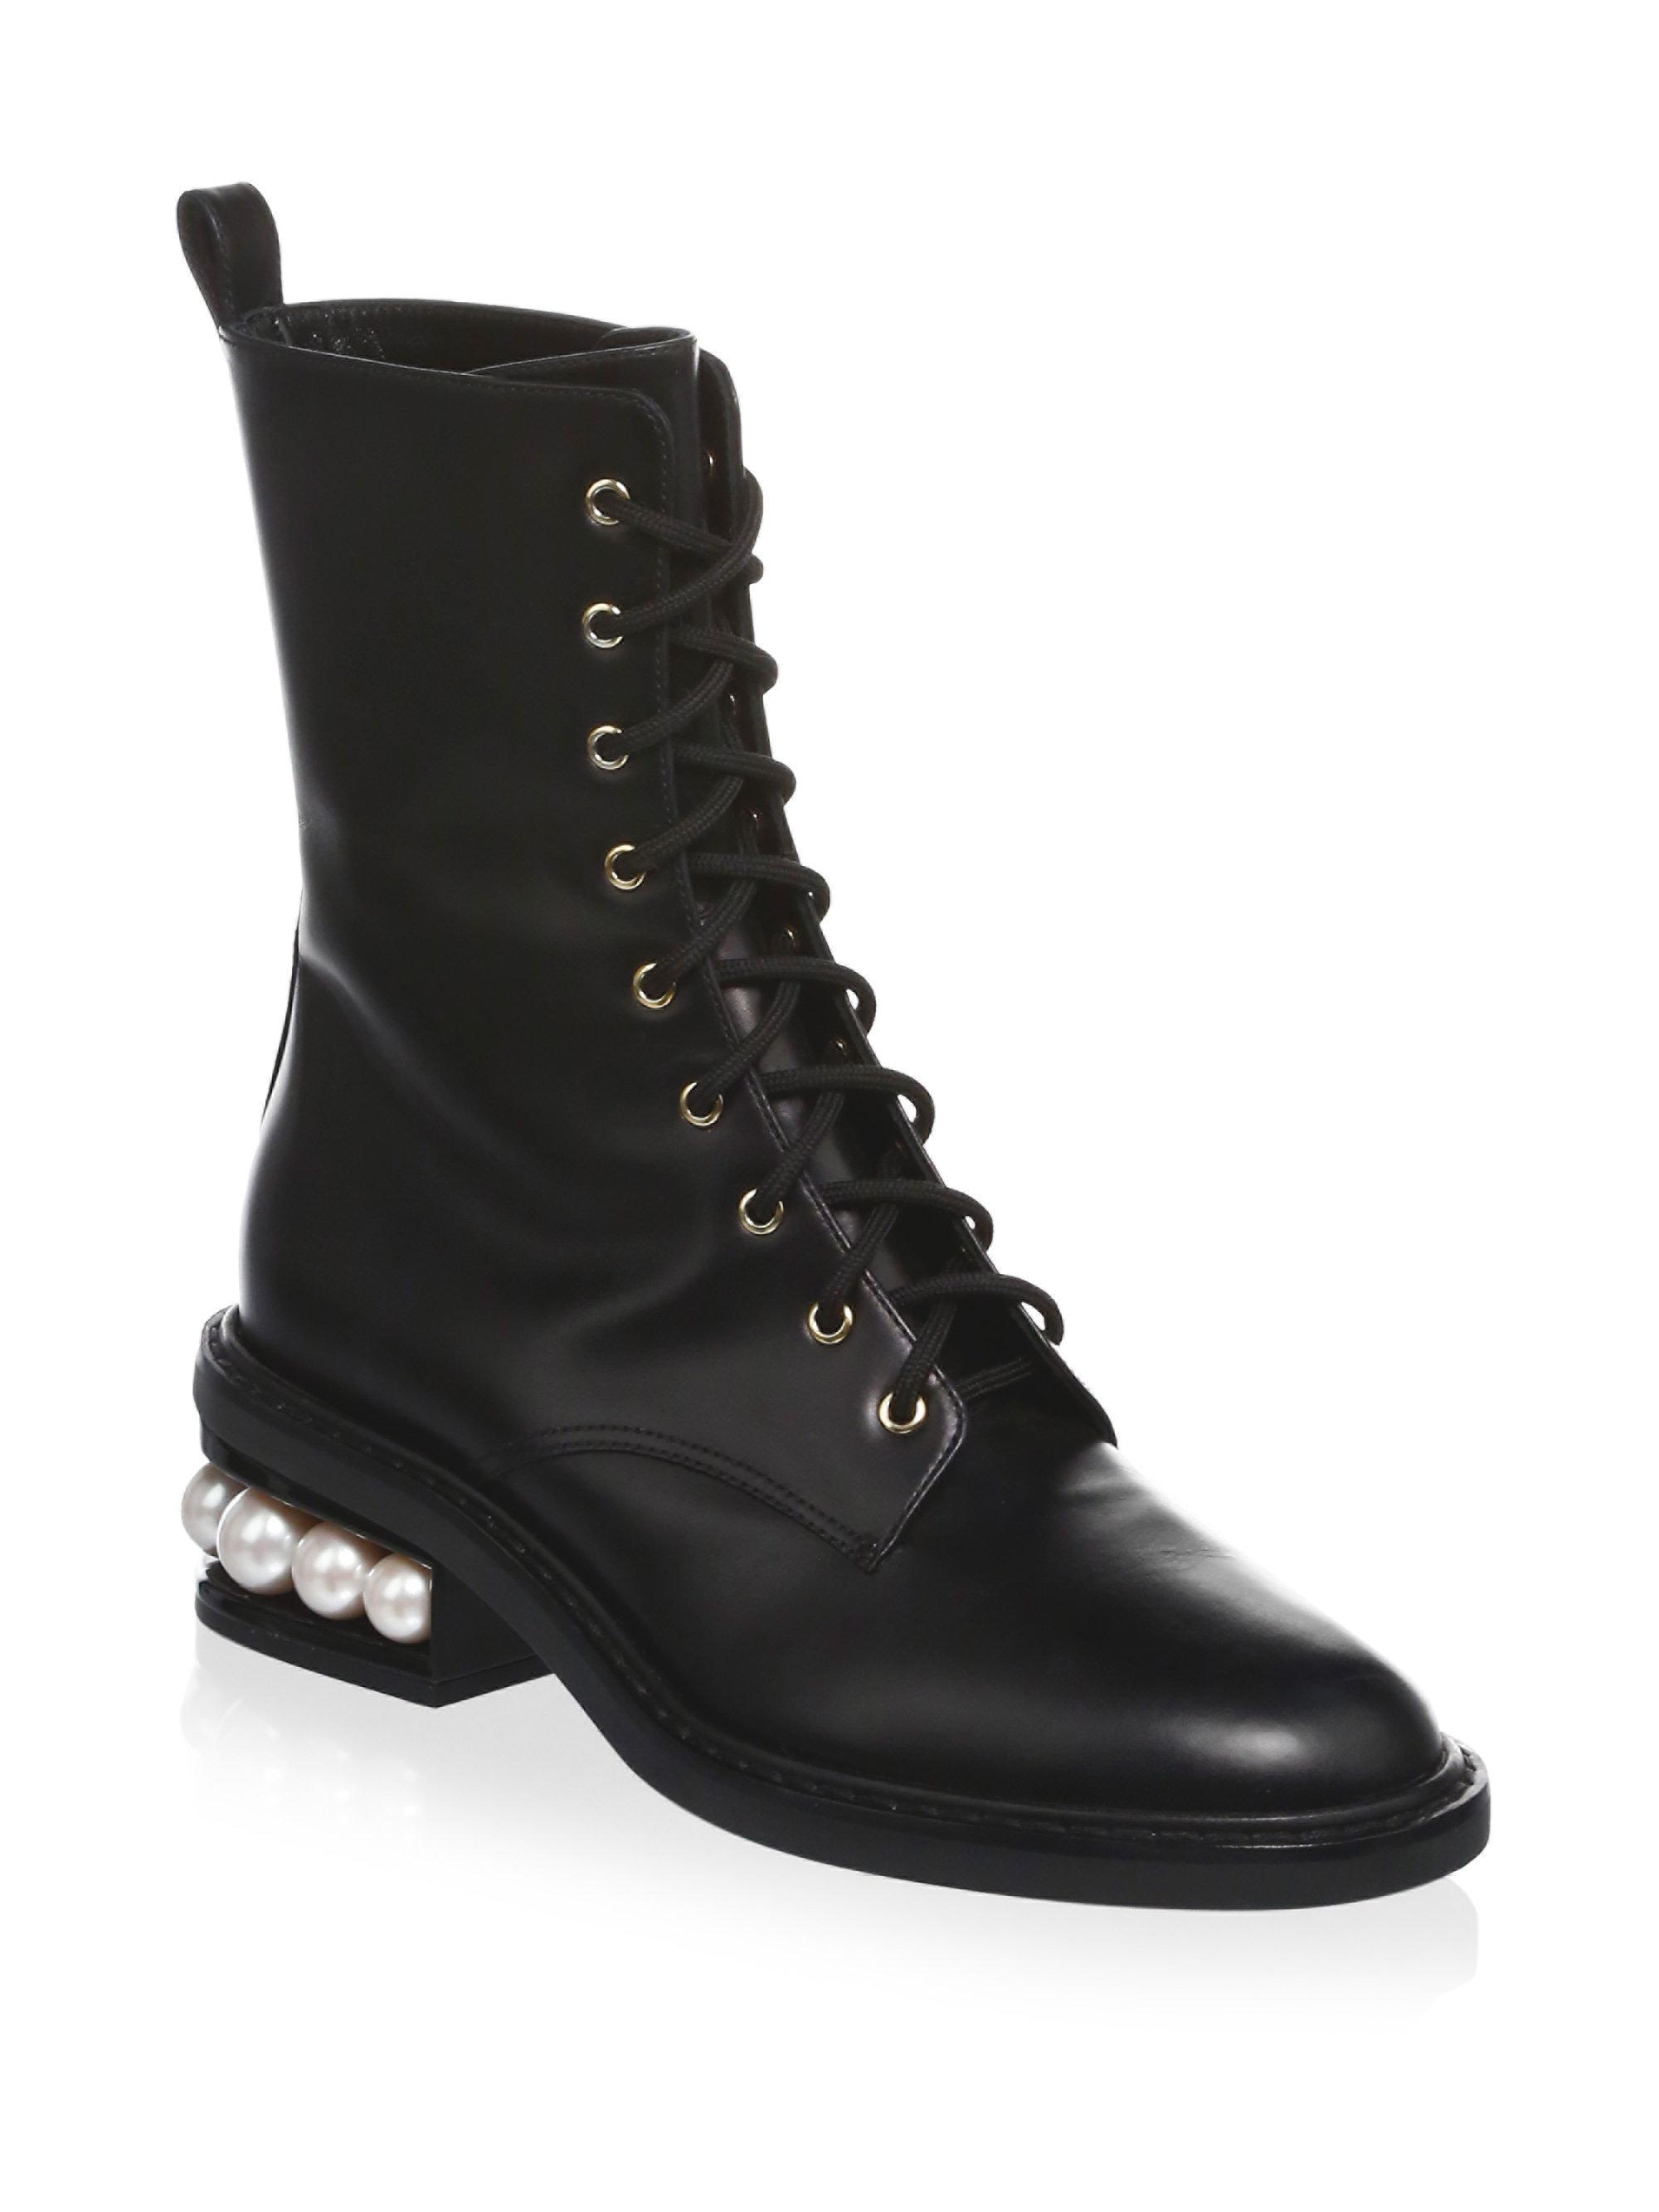 Nicholas Kirkwood Black Leahter & Velvet Hiking Boots OneXx6